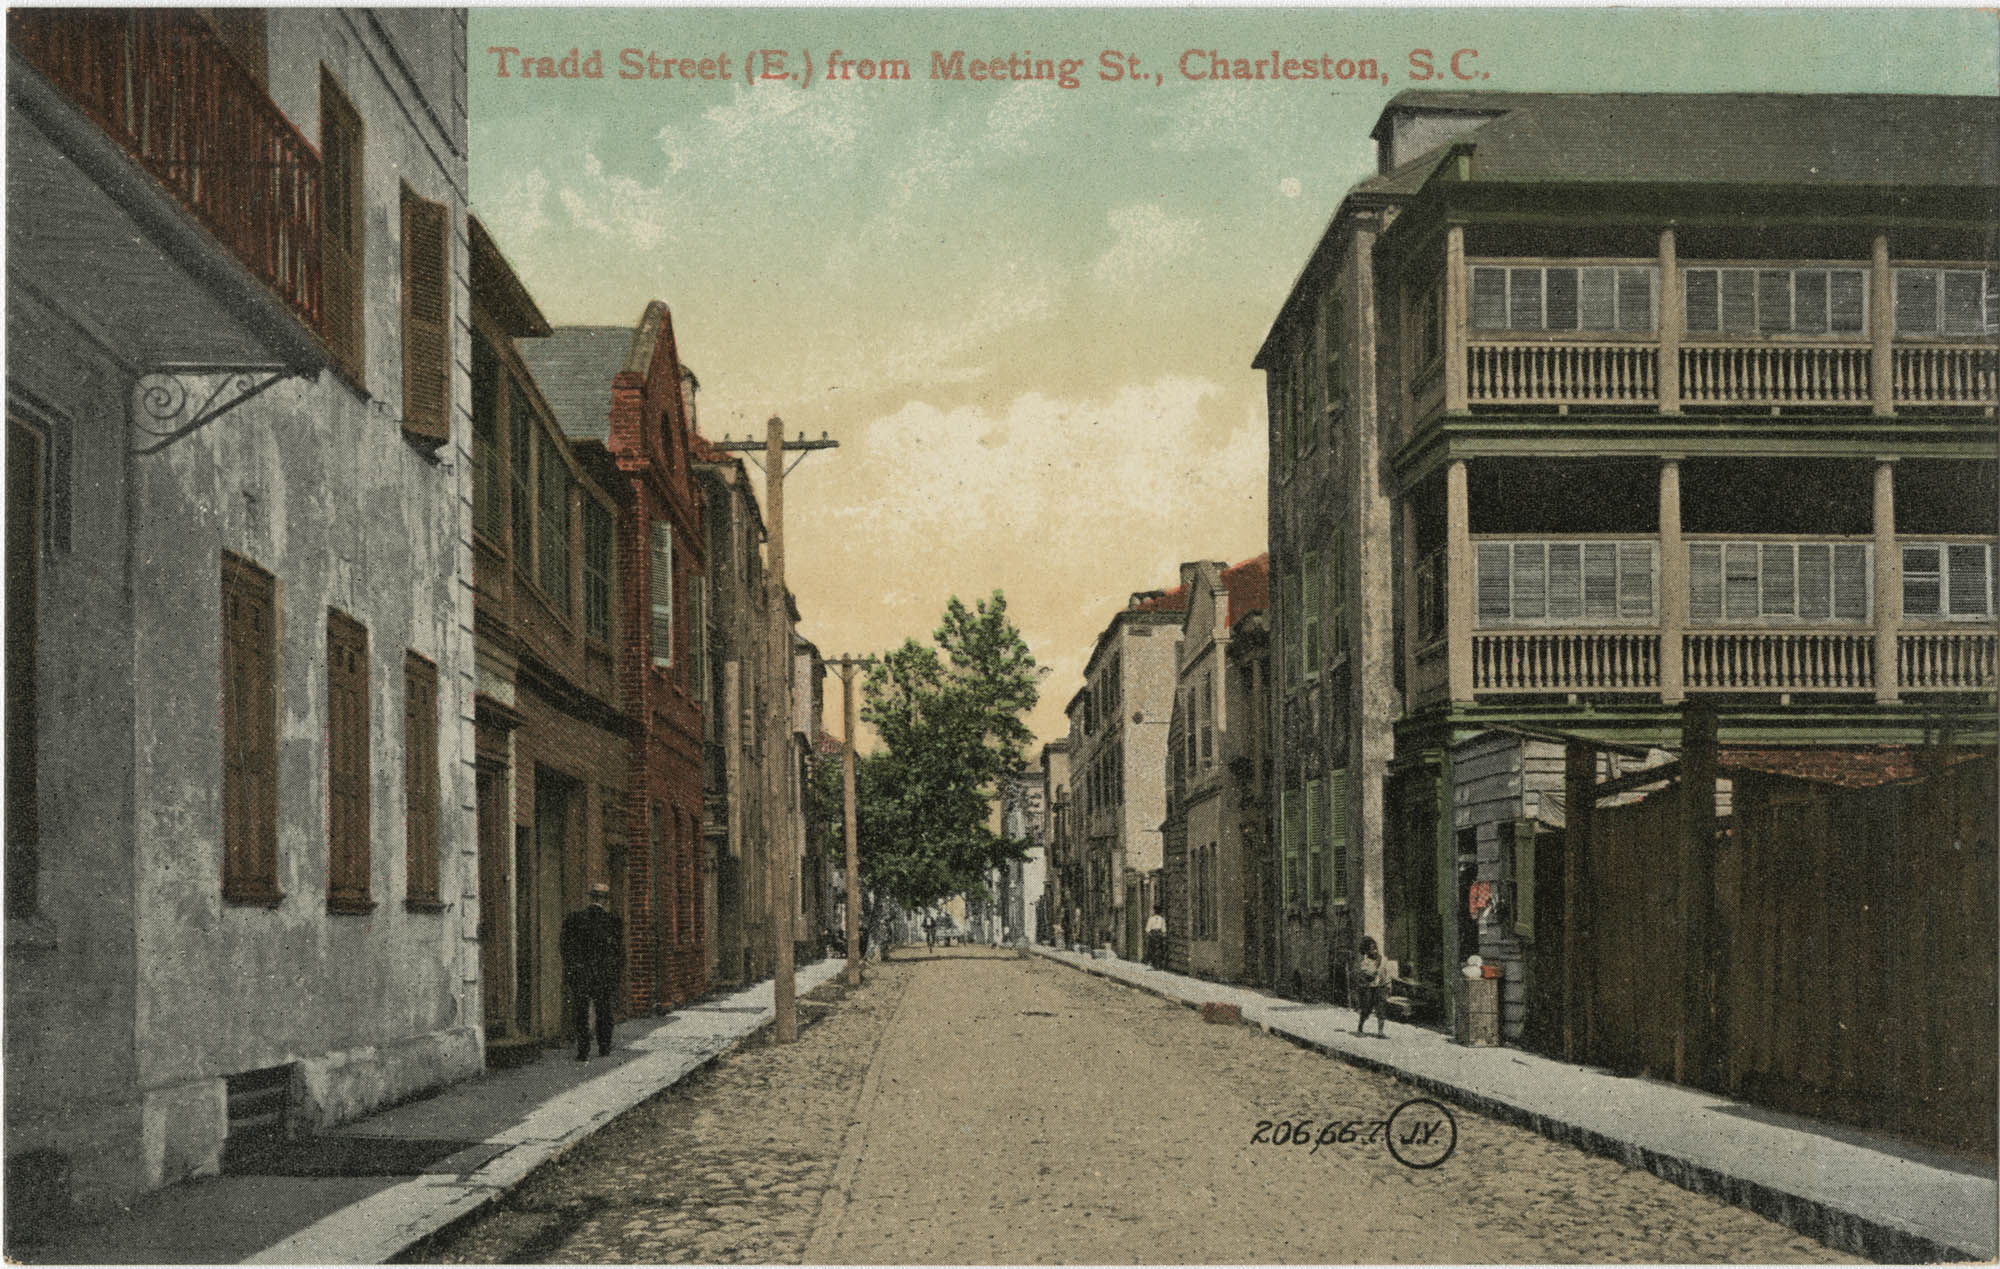 Tradd Street (E.) from Meeting St., Charleston, S.C.